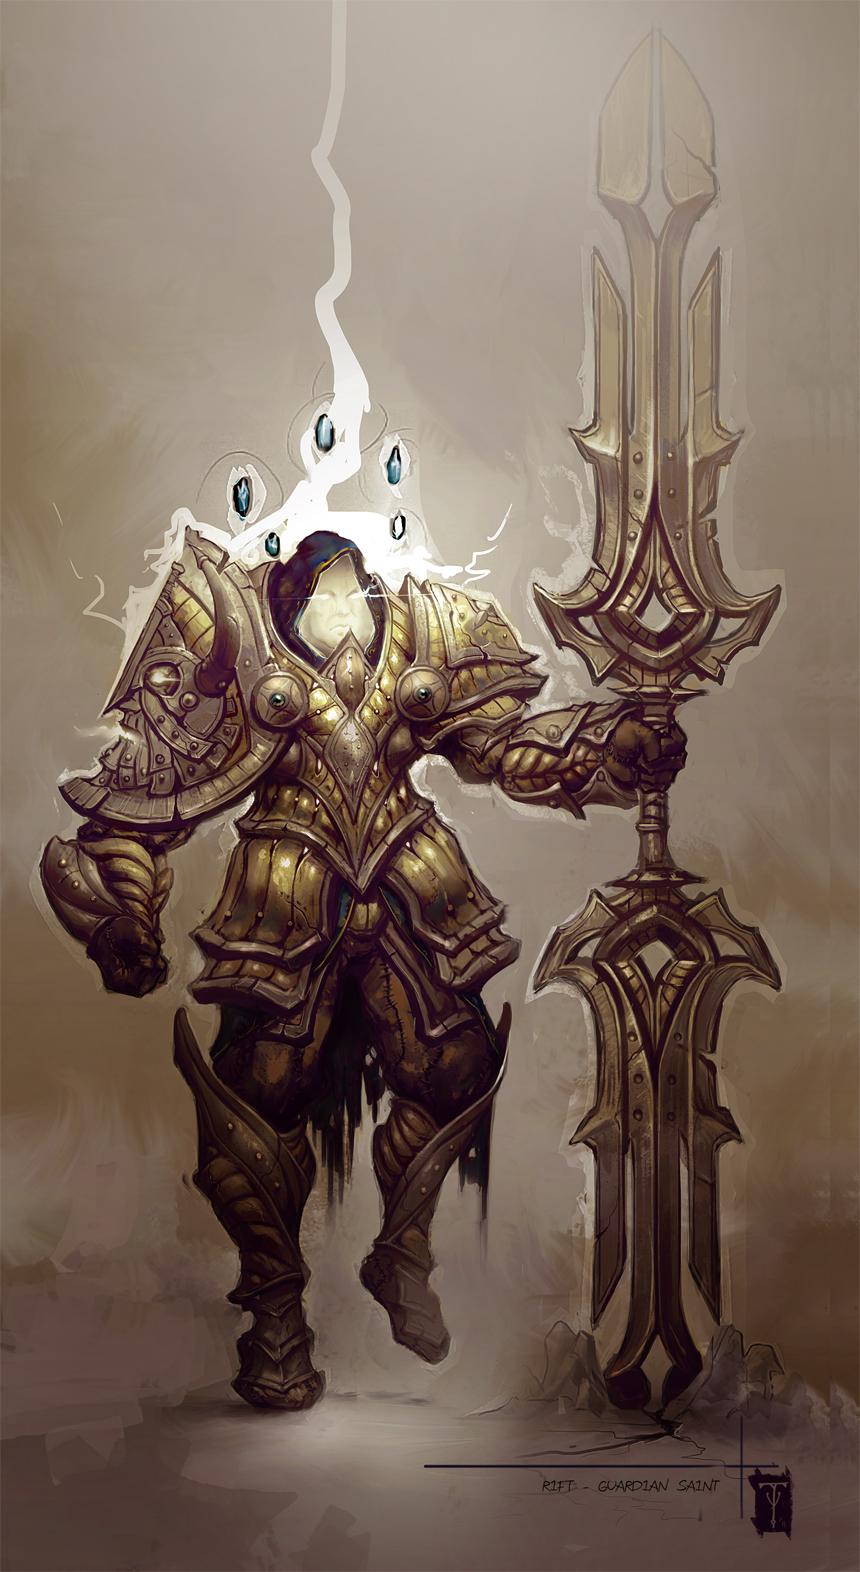 Guardian Saint by ArtofTy